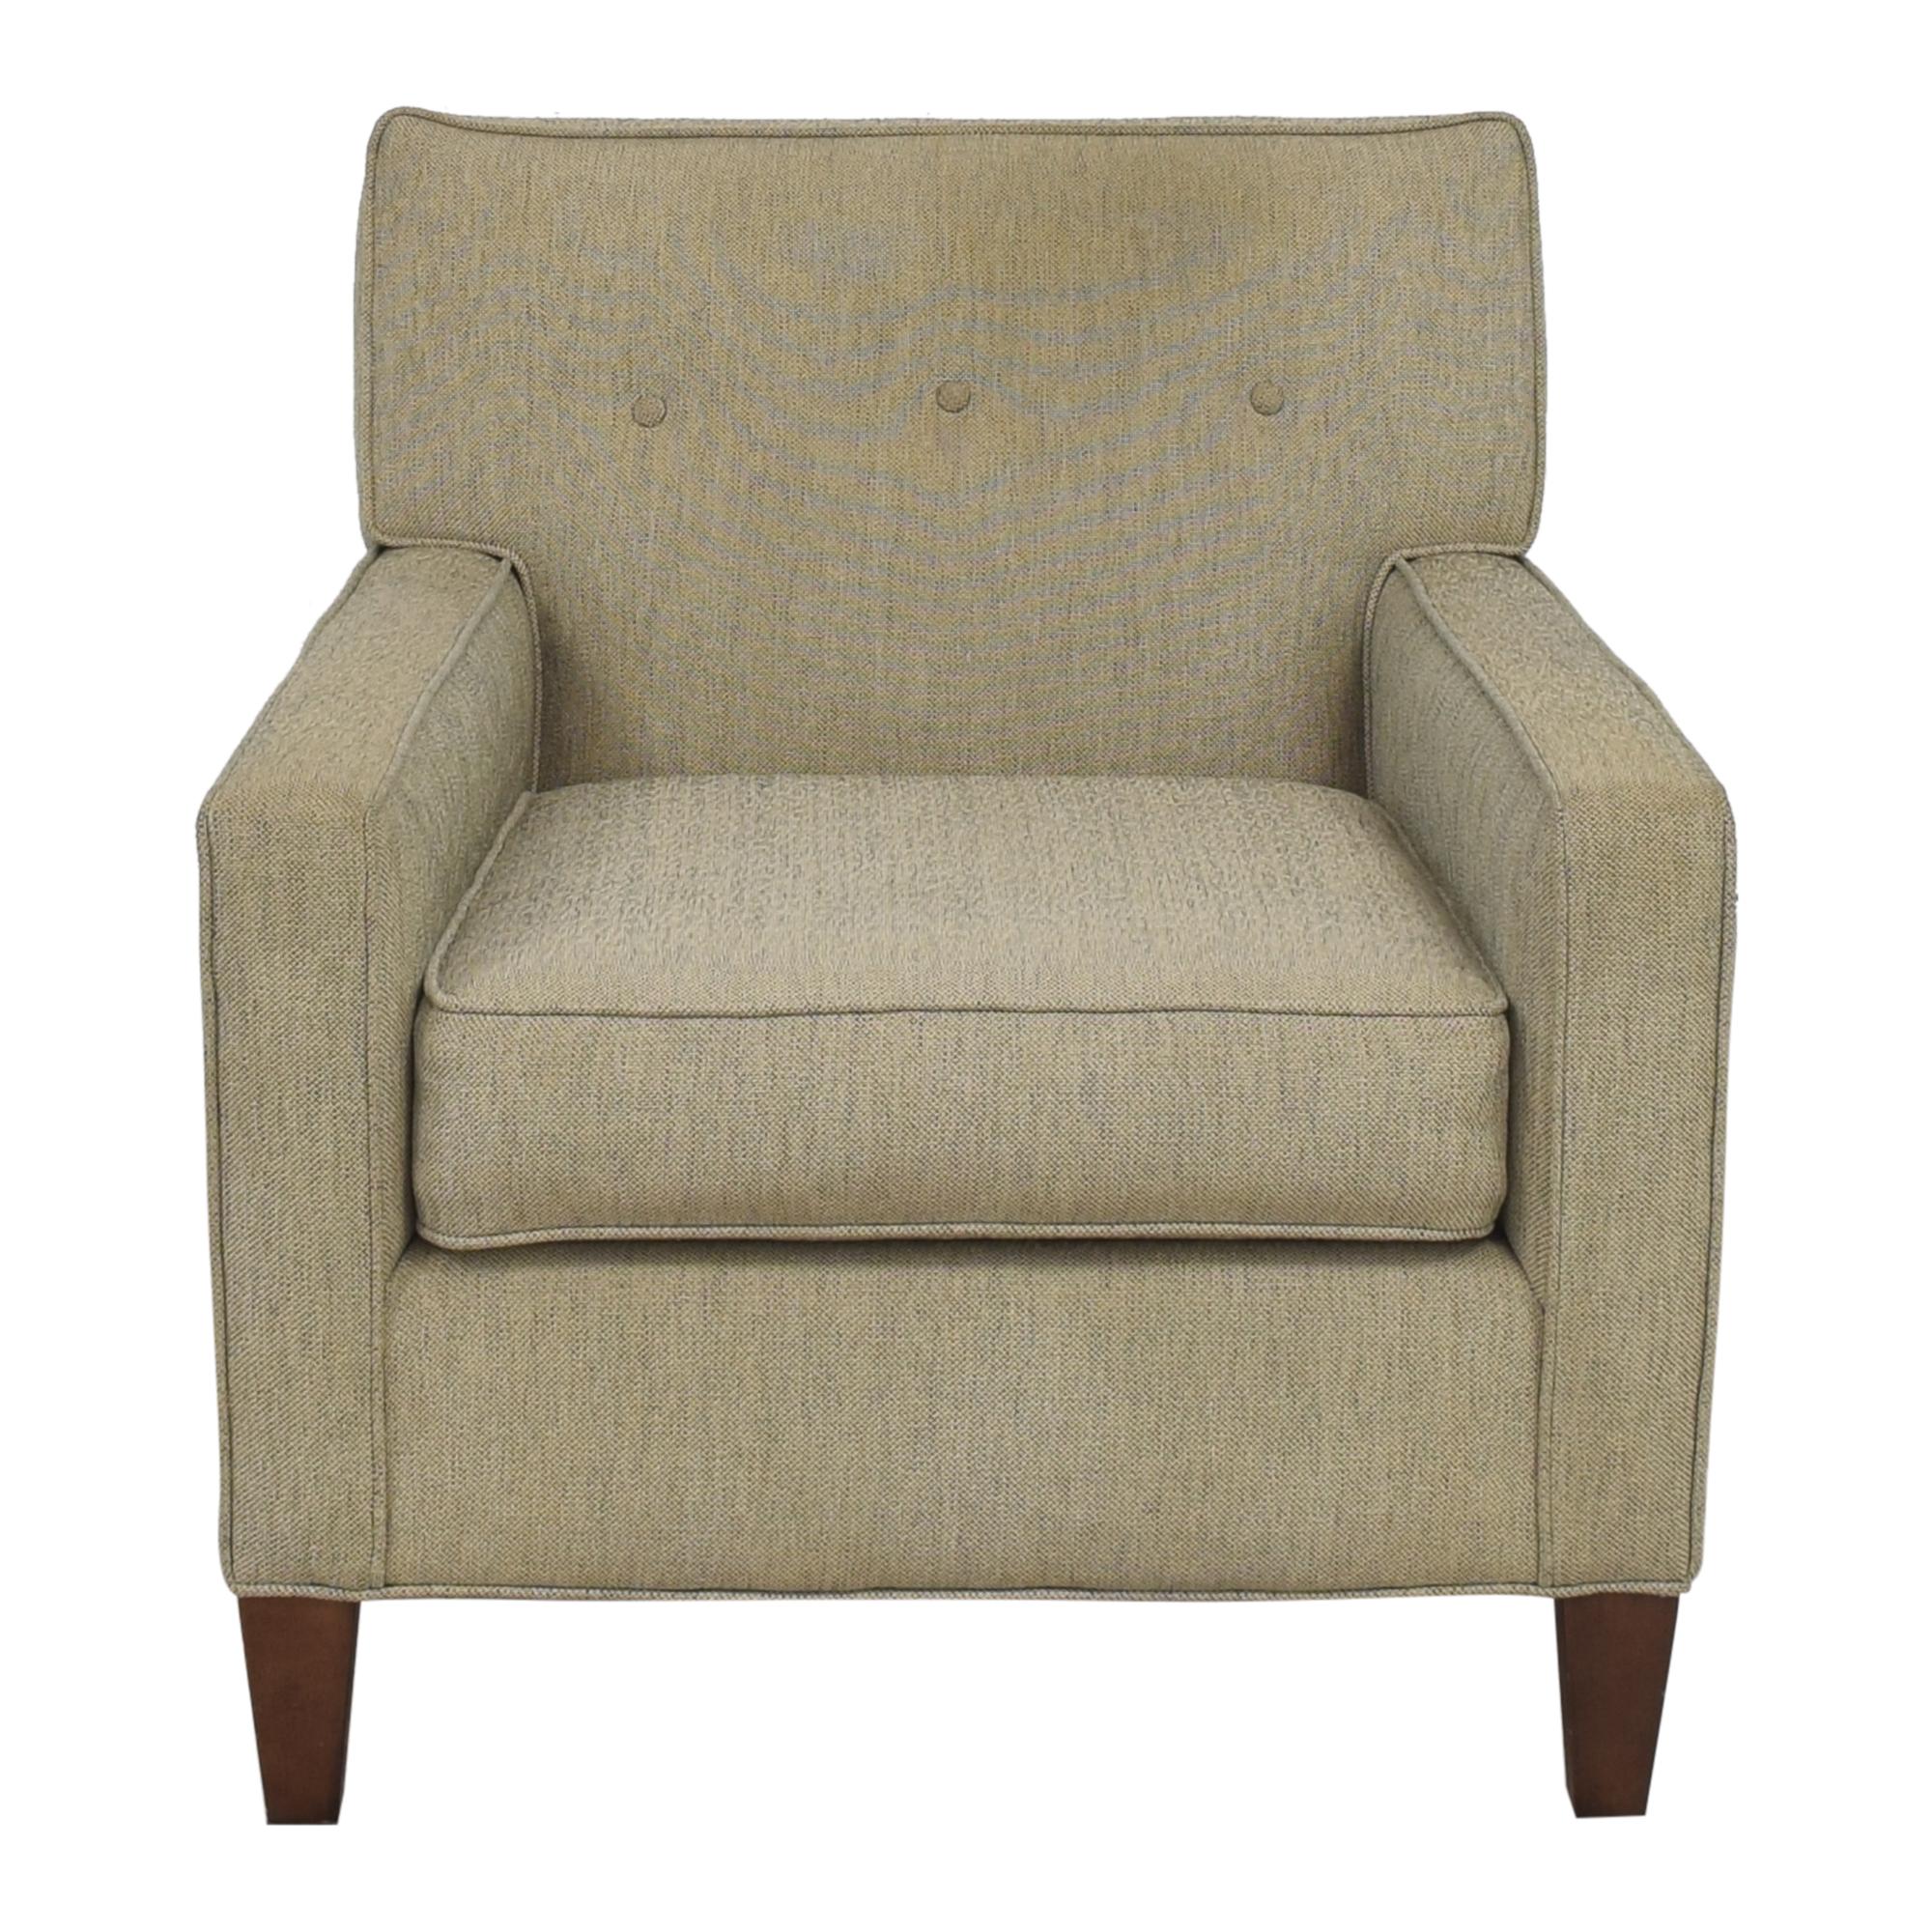 Mitchell Gold + Bob Williams Mitchell Gold + Bob Williams Dexter Chair on sale